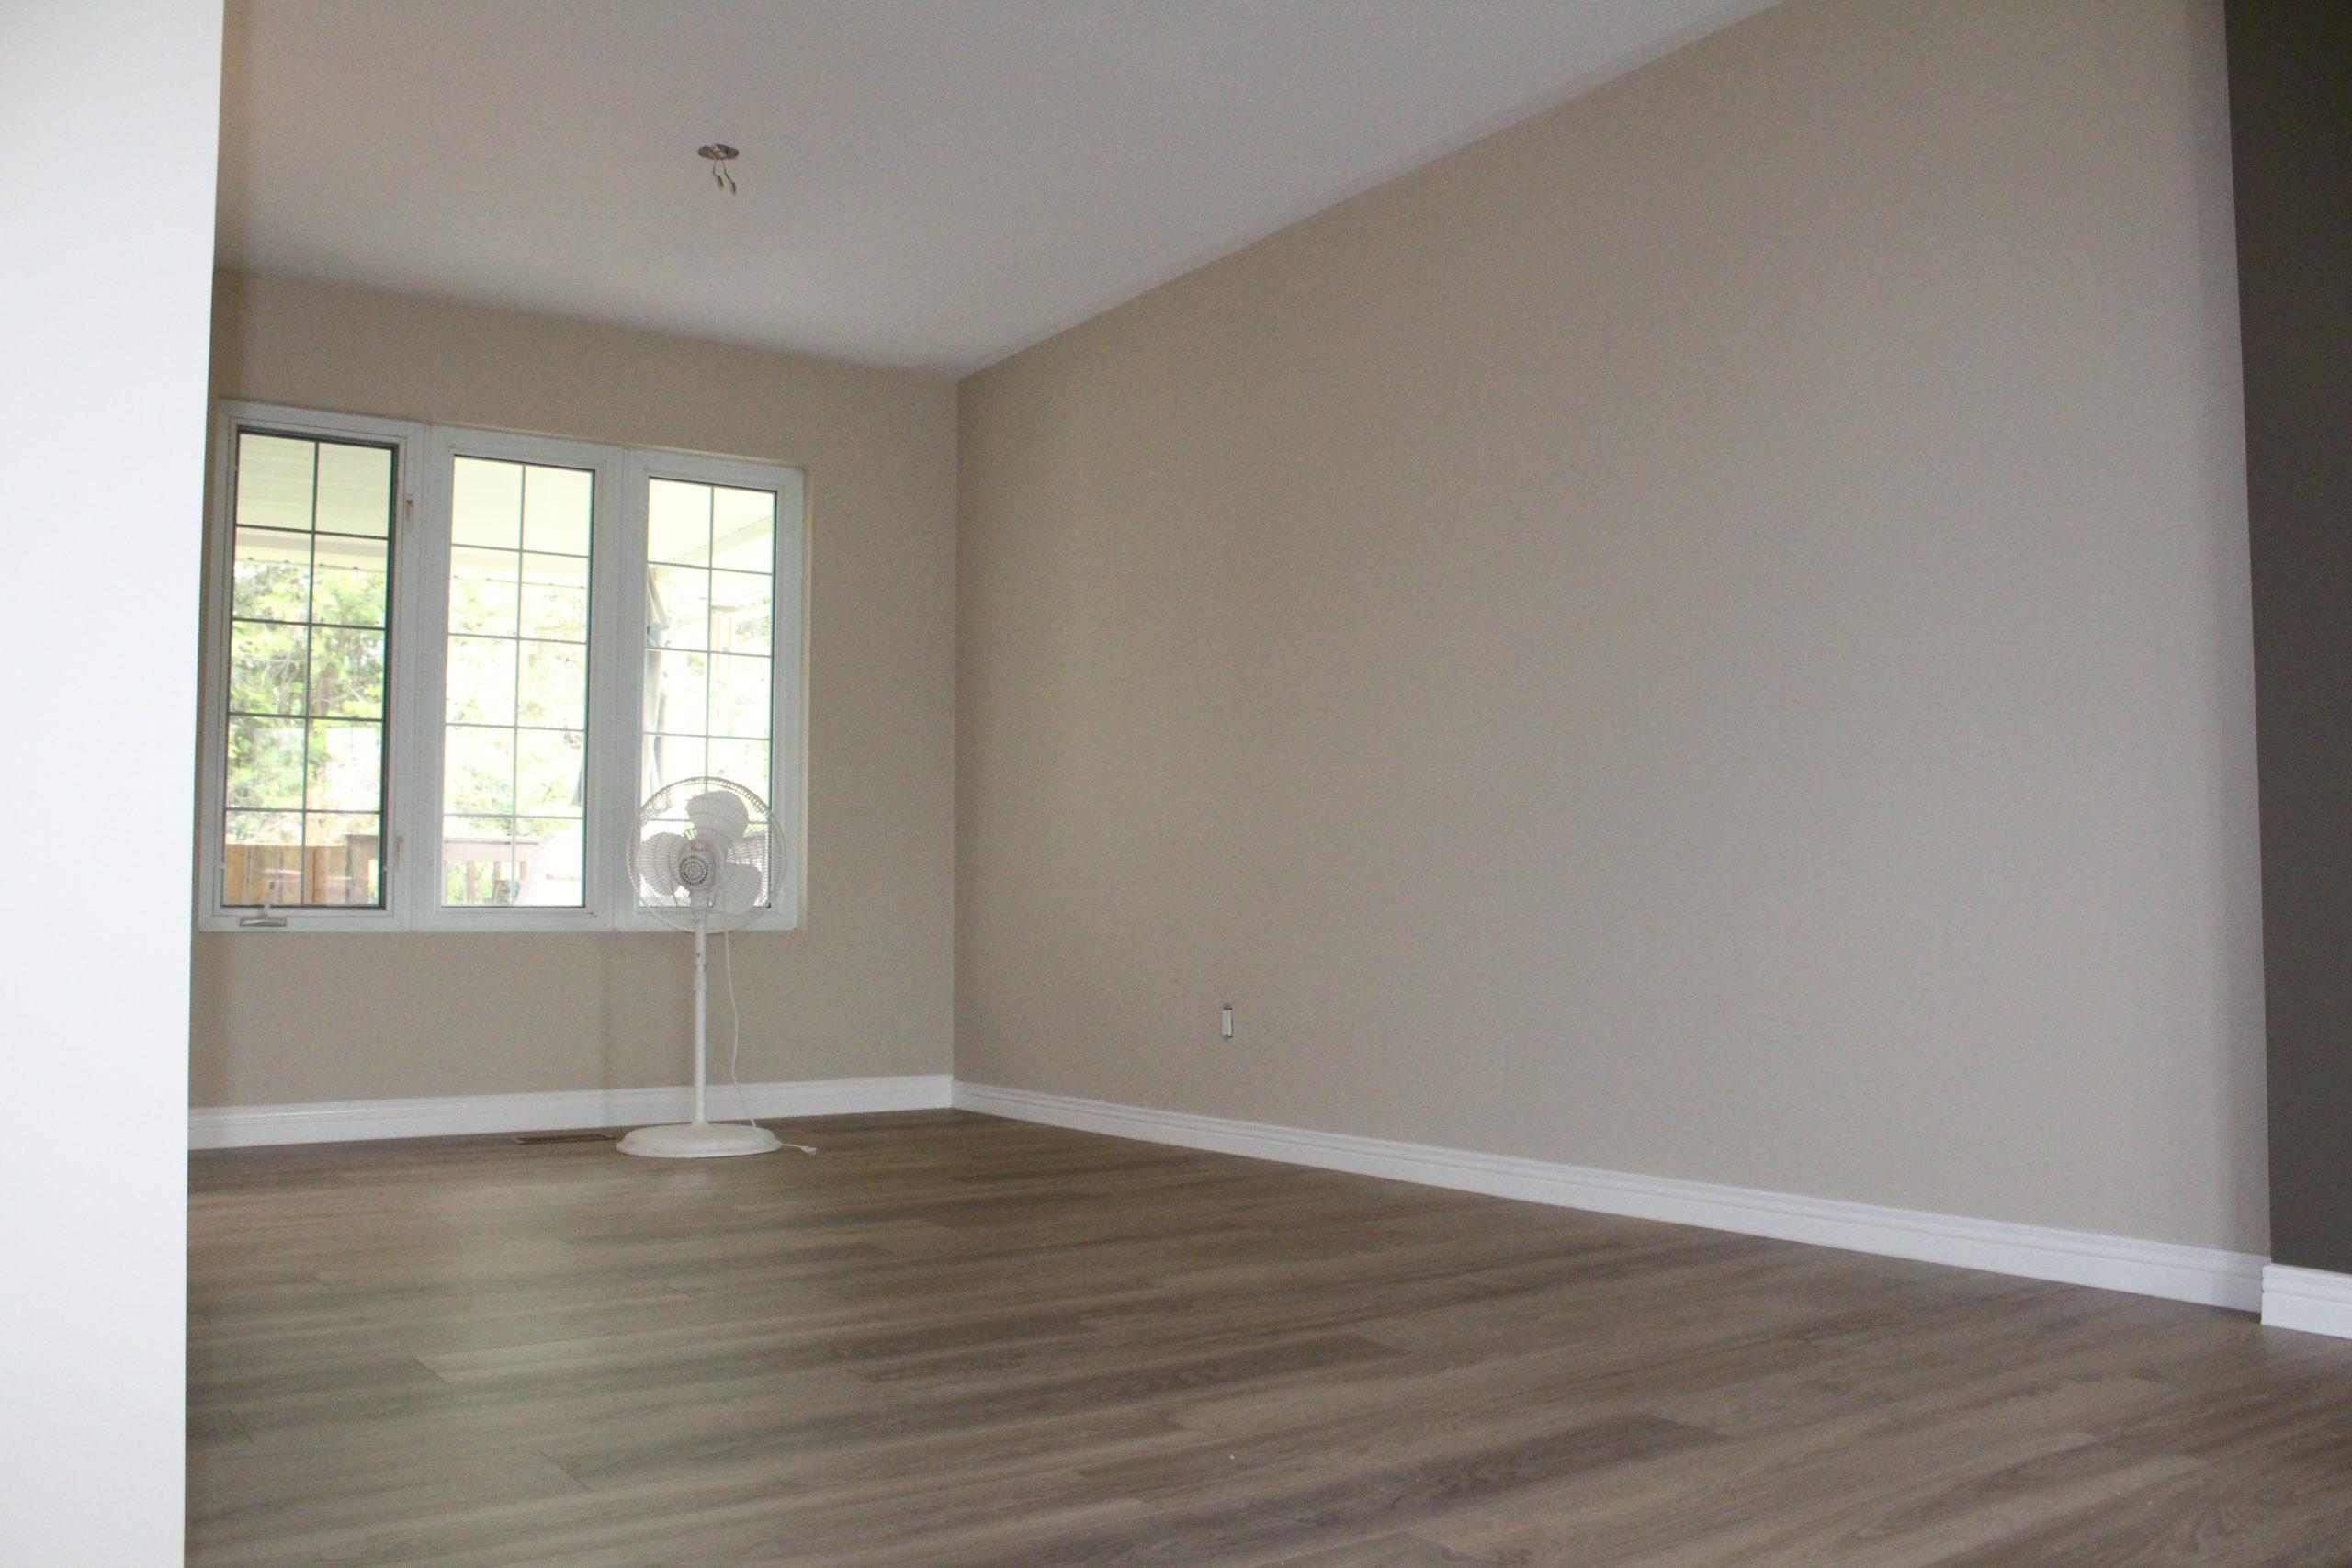 Paint, trim and floor